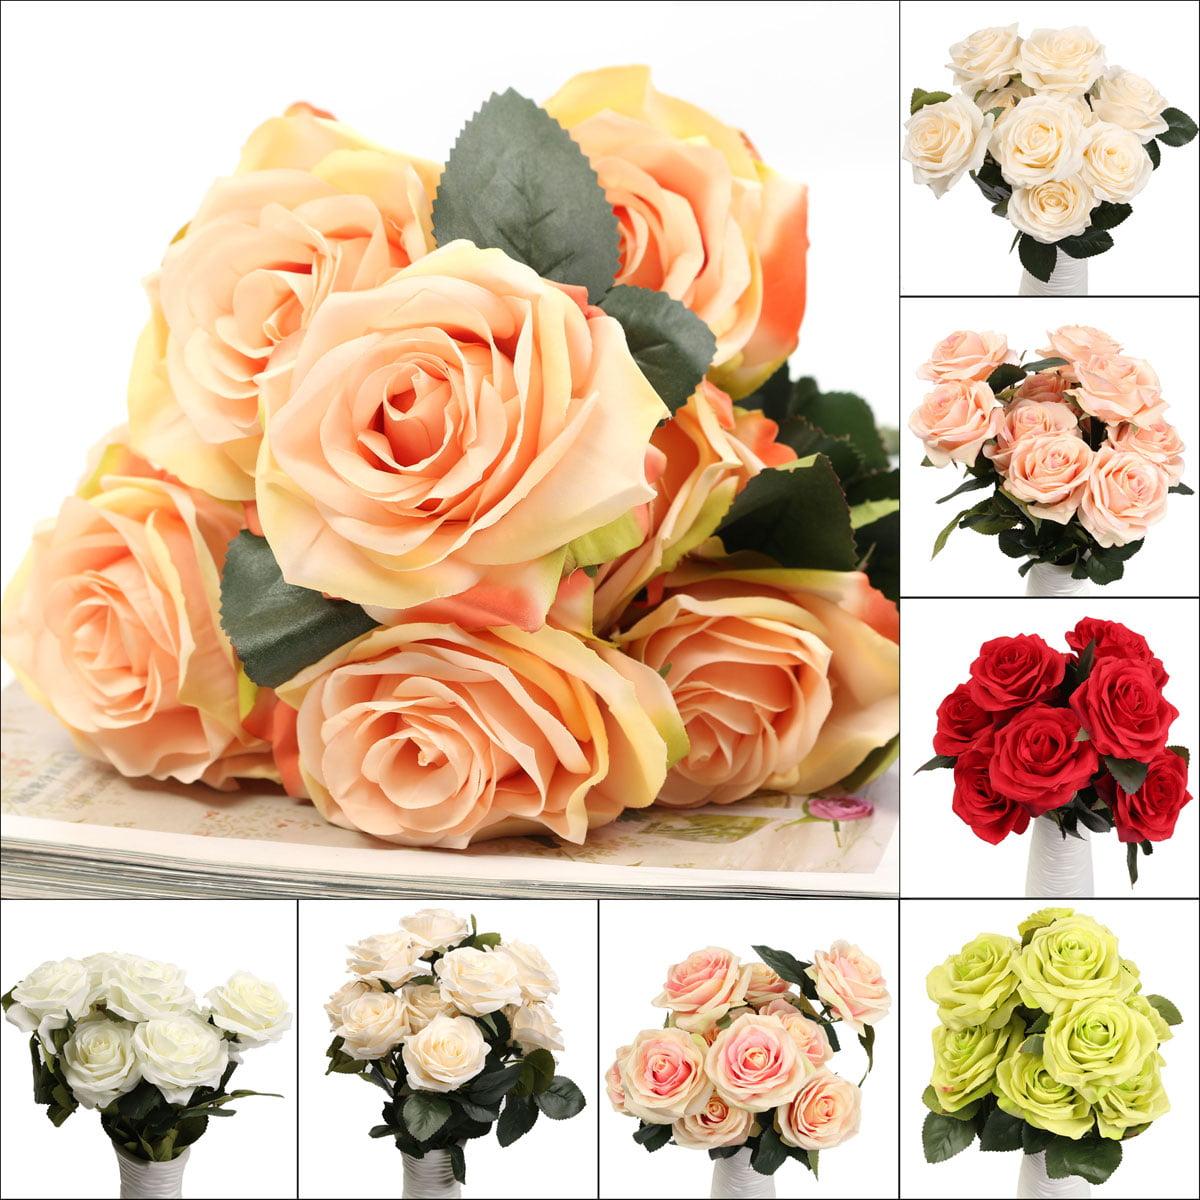 10 Head 1 BouquetAartificial Artificial Flowers Rose Flower Fake Silk Rose Flower Home Room Wedding Party Decor